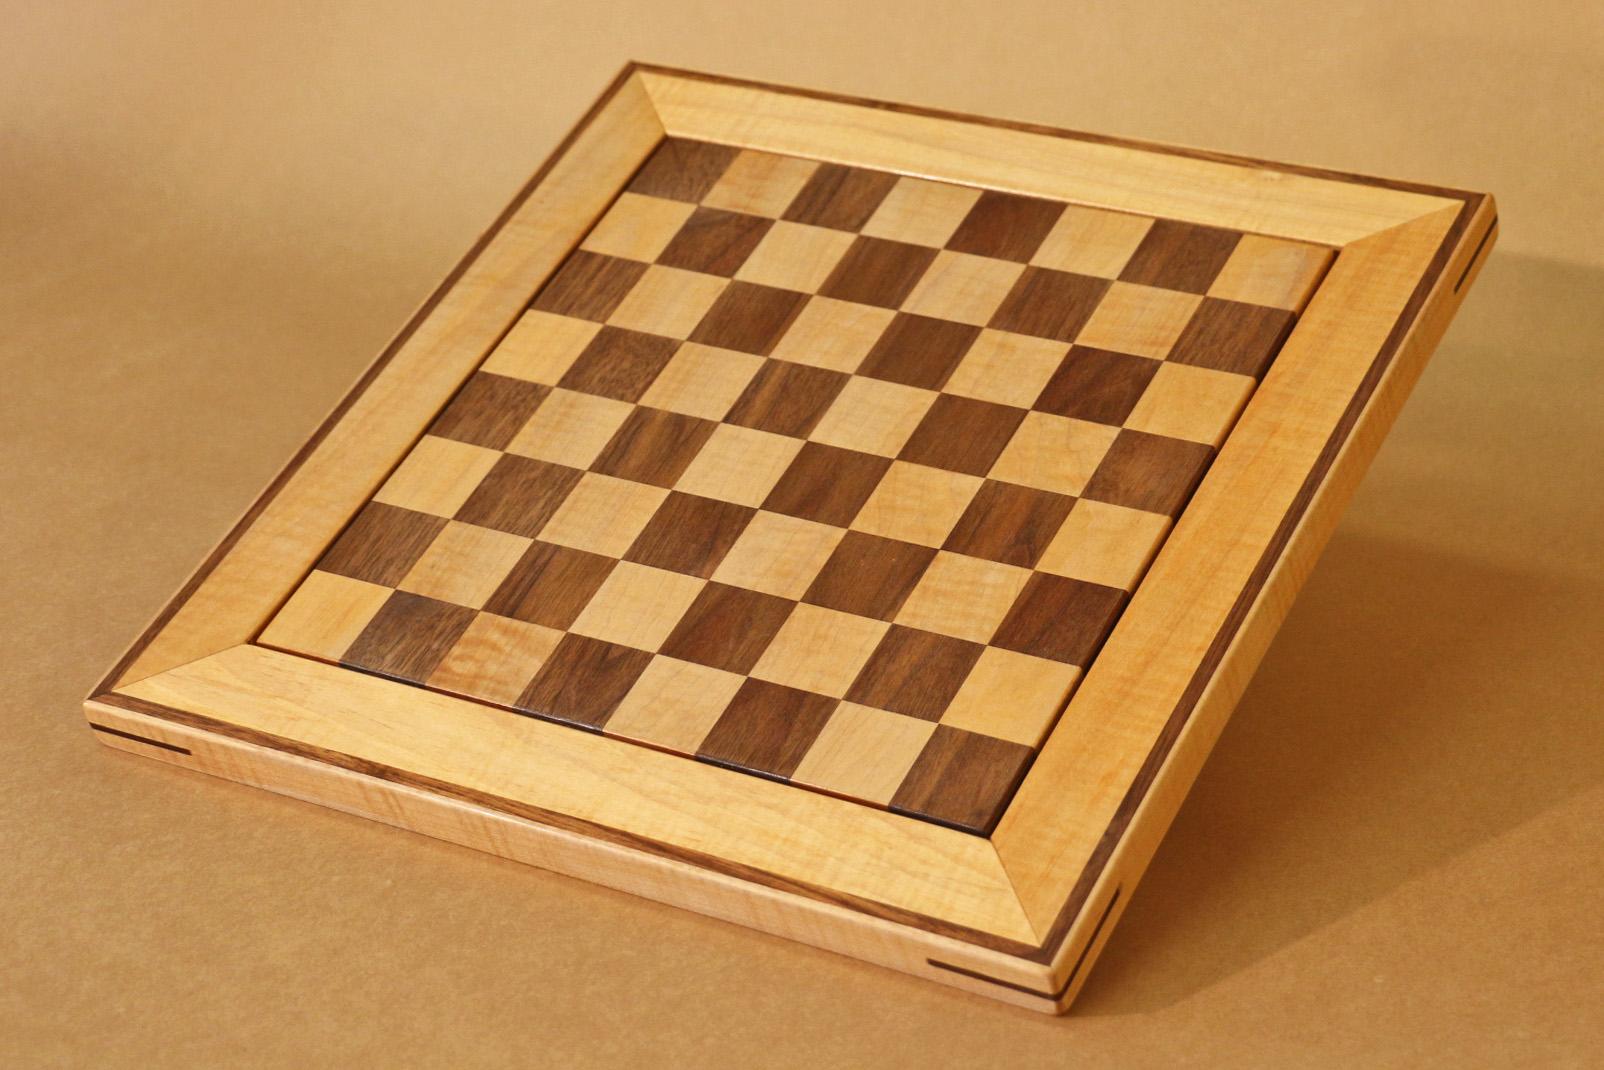 Walnut and Maple Chess Board.jpg